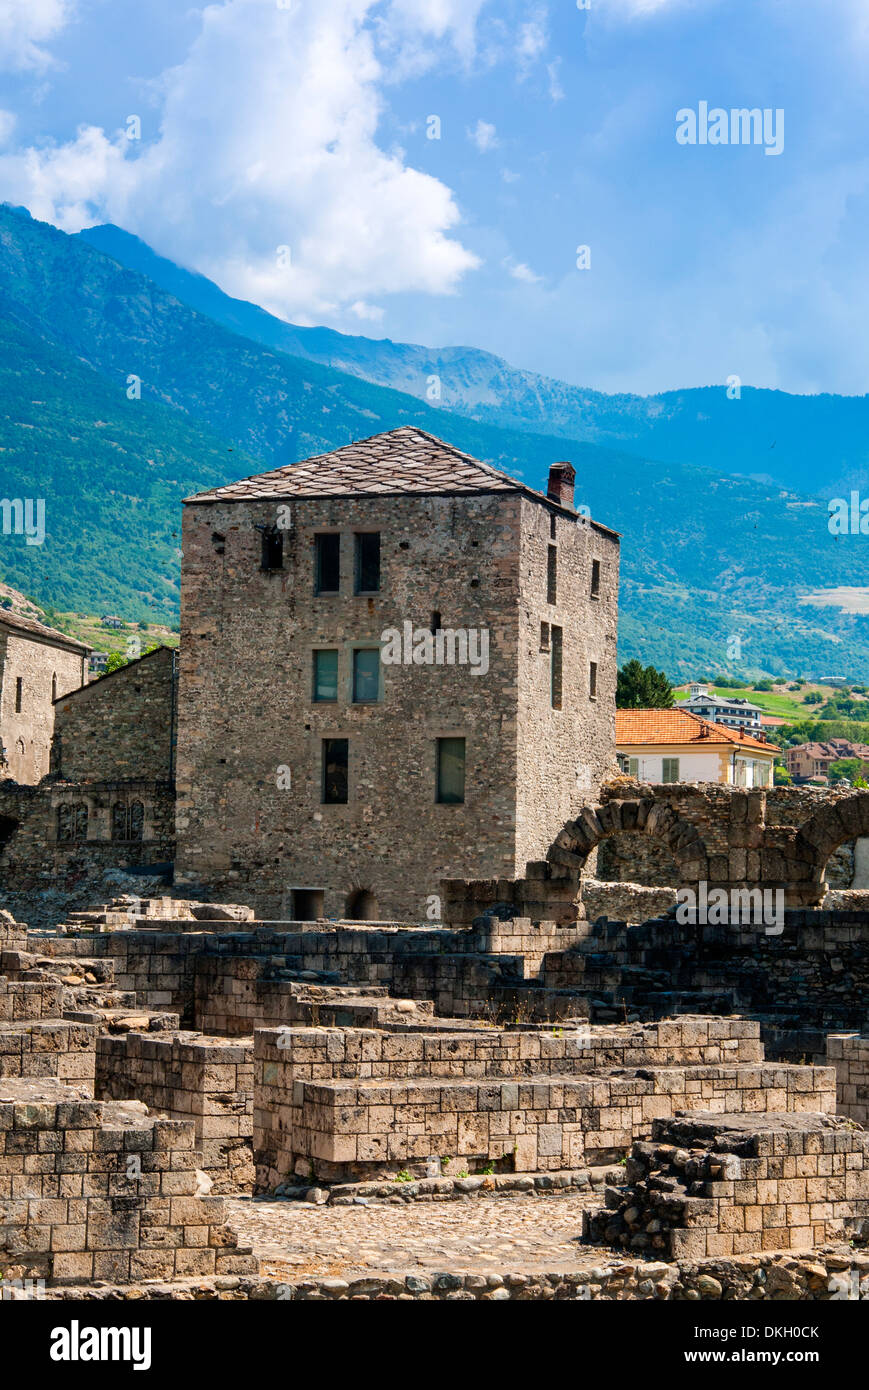 Roman Theater (Teatro Romano) and Fromage tower, Aosta, Aosta Valley, Italian Alps, Italy, Europe - Stock Image